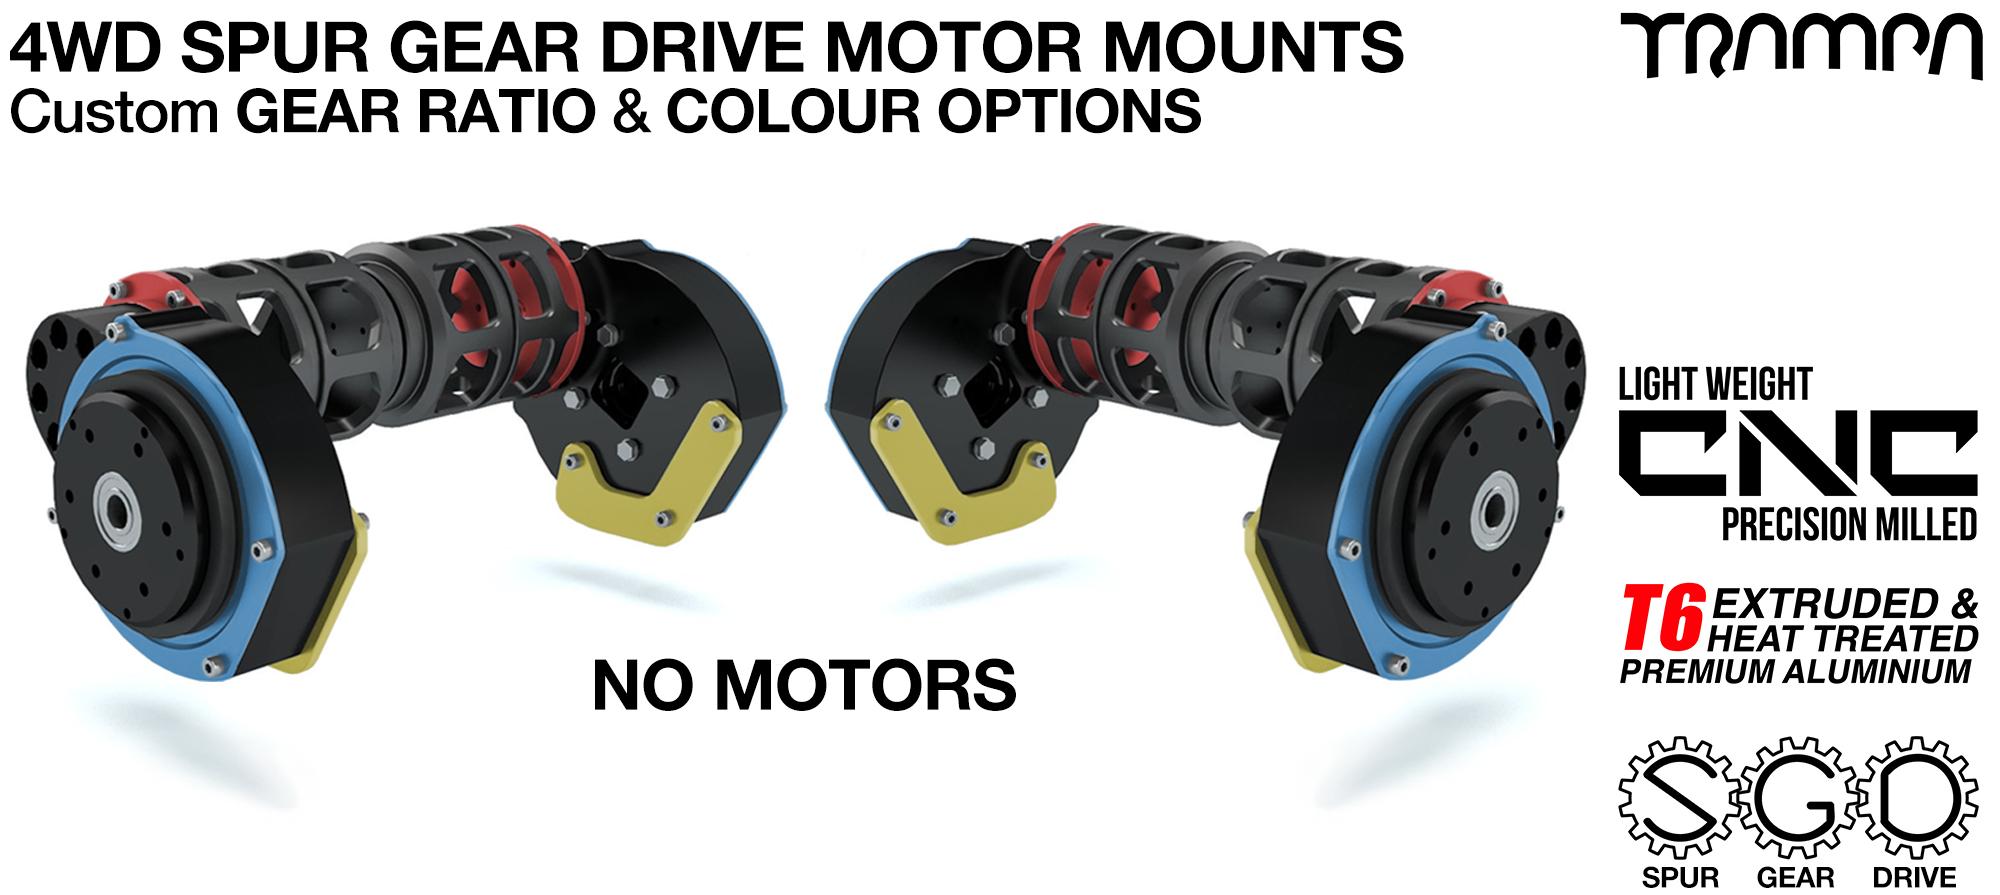 TRAMPA 4WD LOADED Spur Gear Drive Motor Mount kit with MOTORS PULLEYS & MOTOR Filters